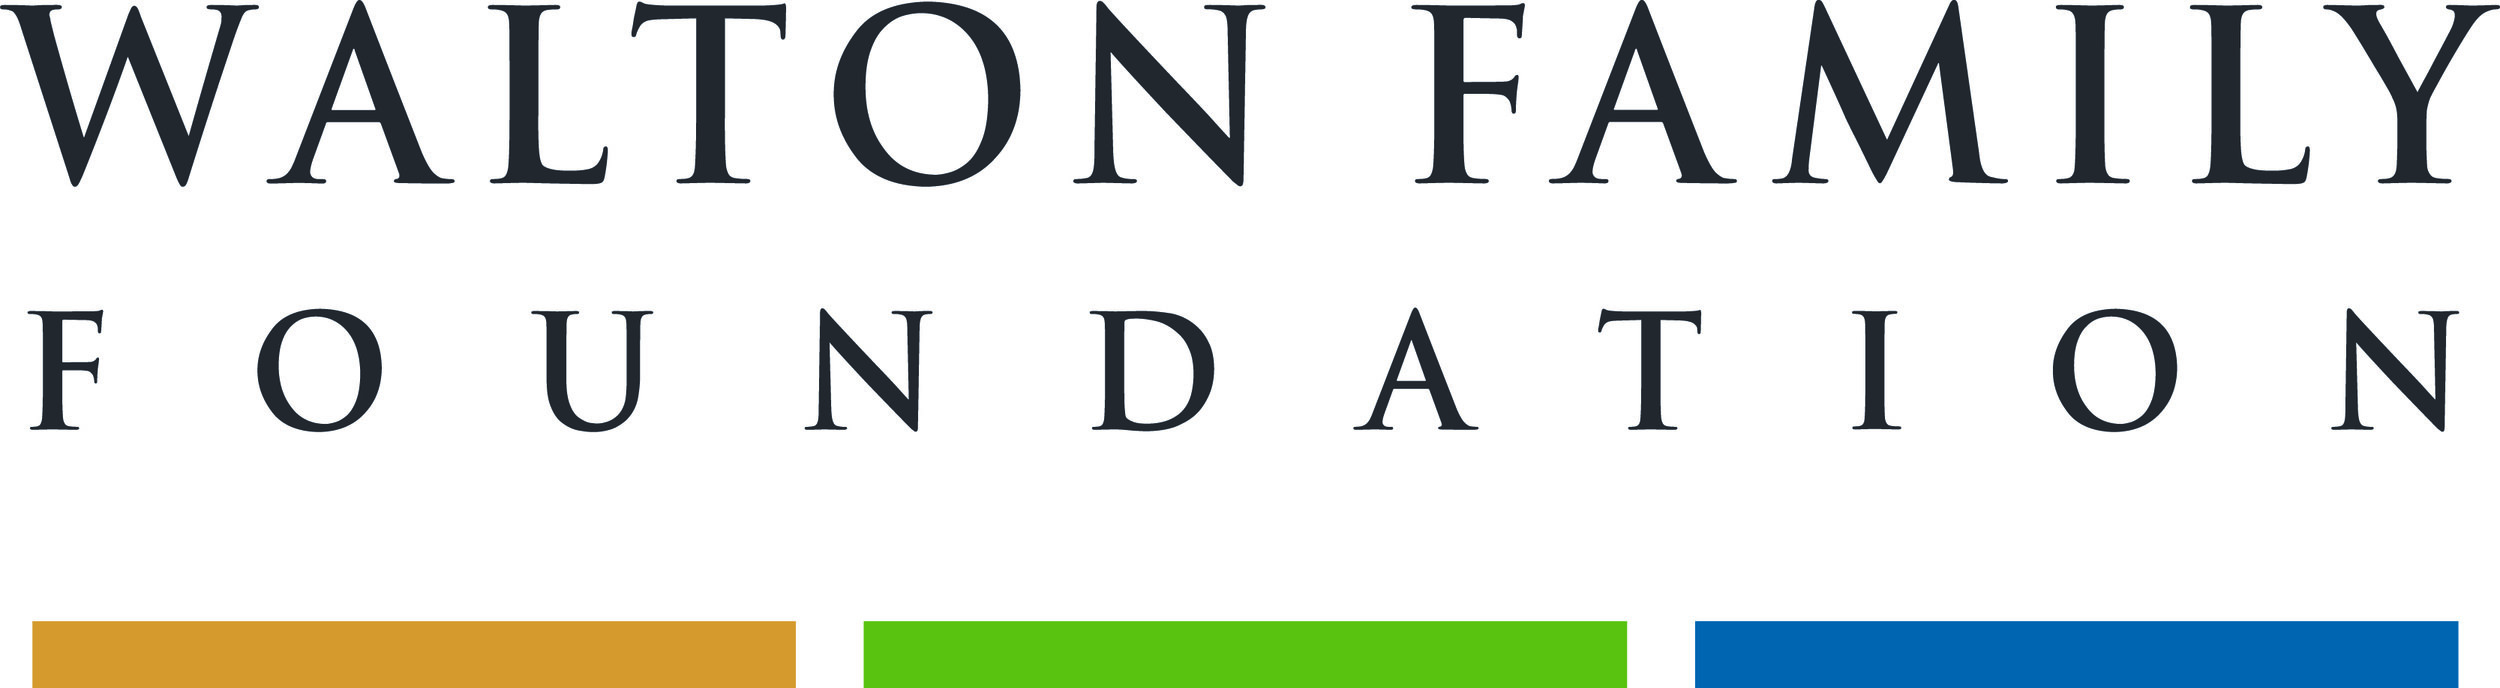 Walton Family Foundation Logo_FullColor_CMYK.jpg